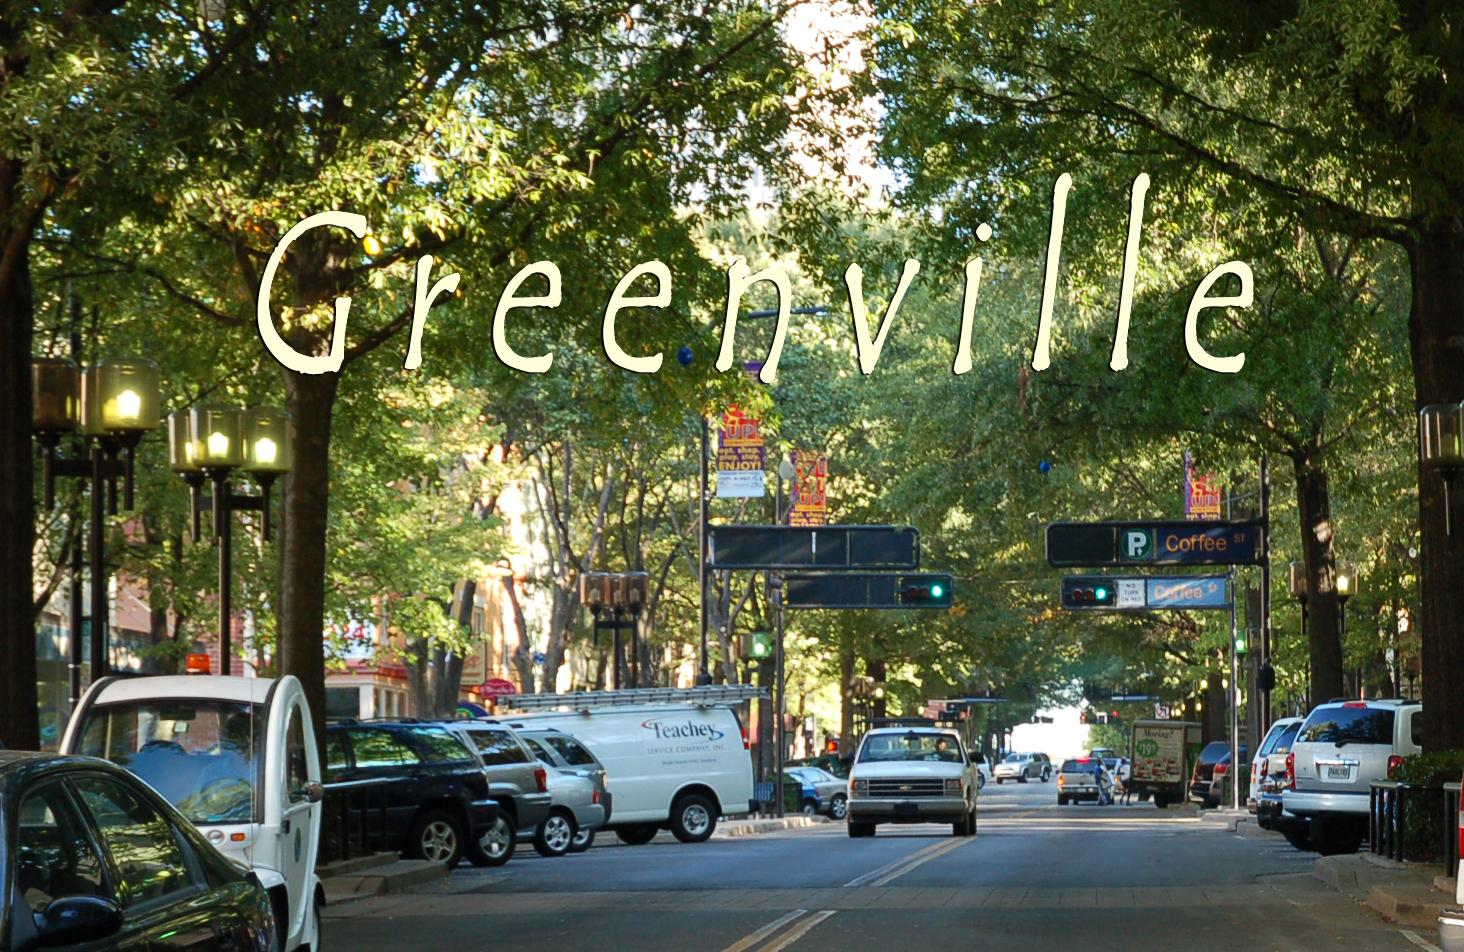 place greenville sc woodruff and five forks sc xidnlkvljpg 1464x952